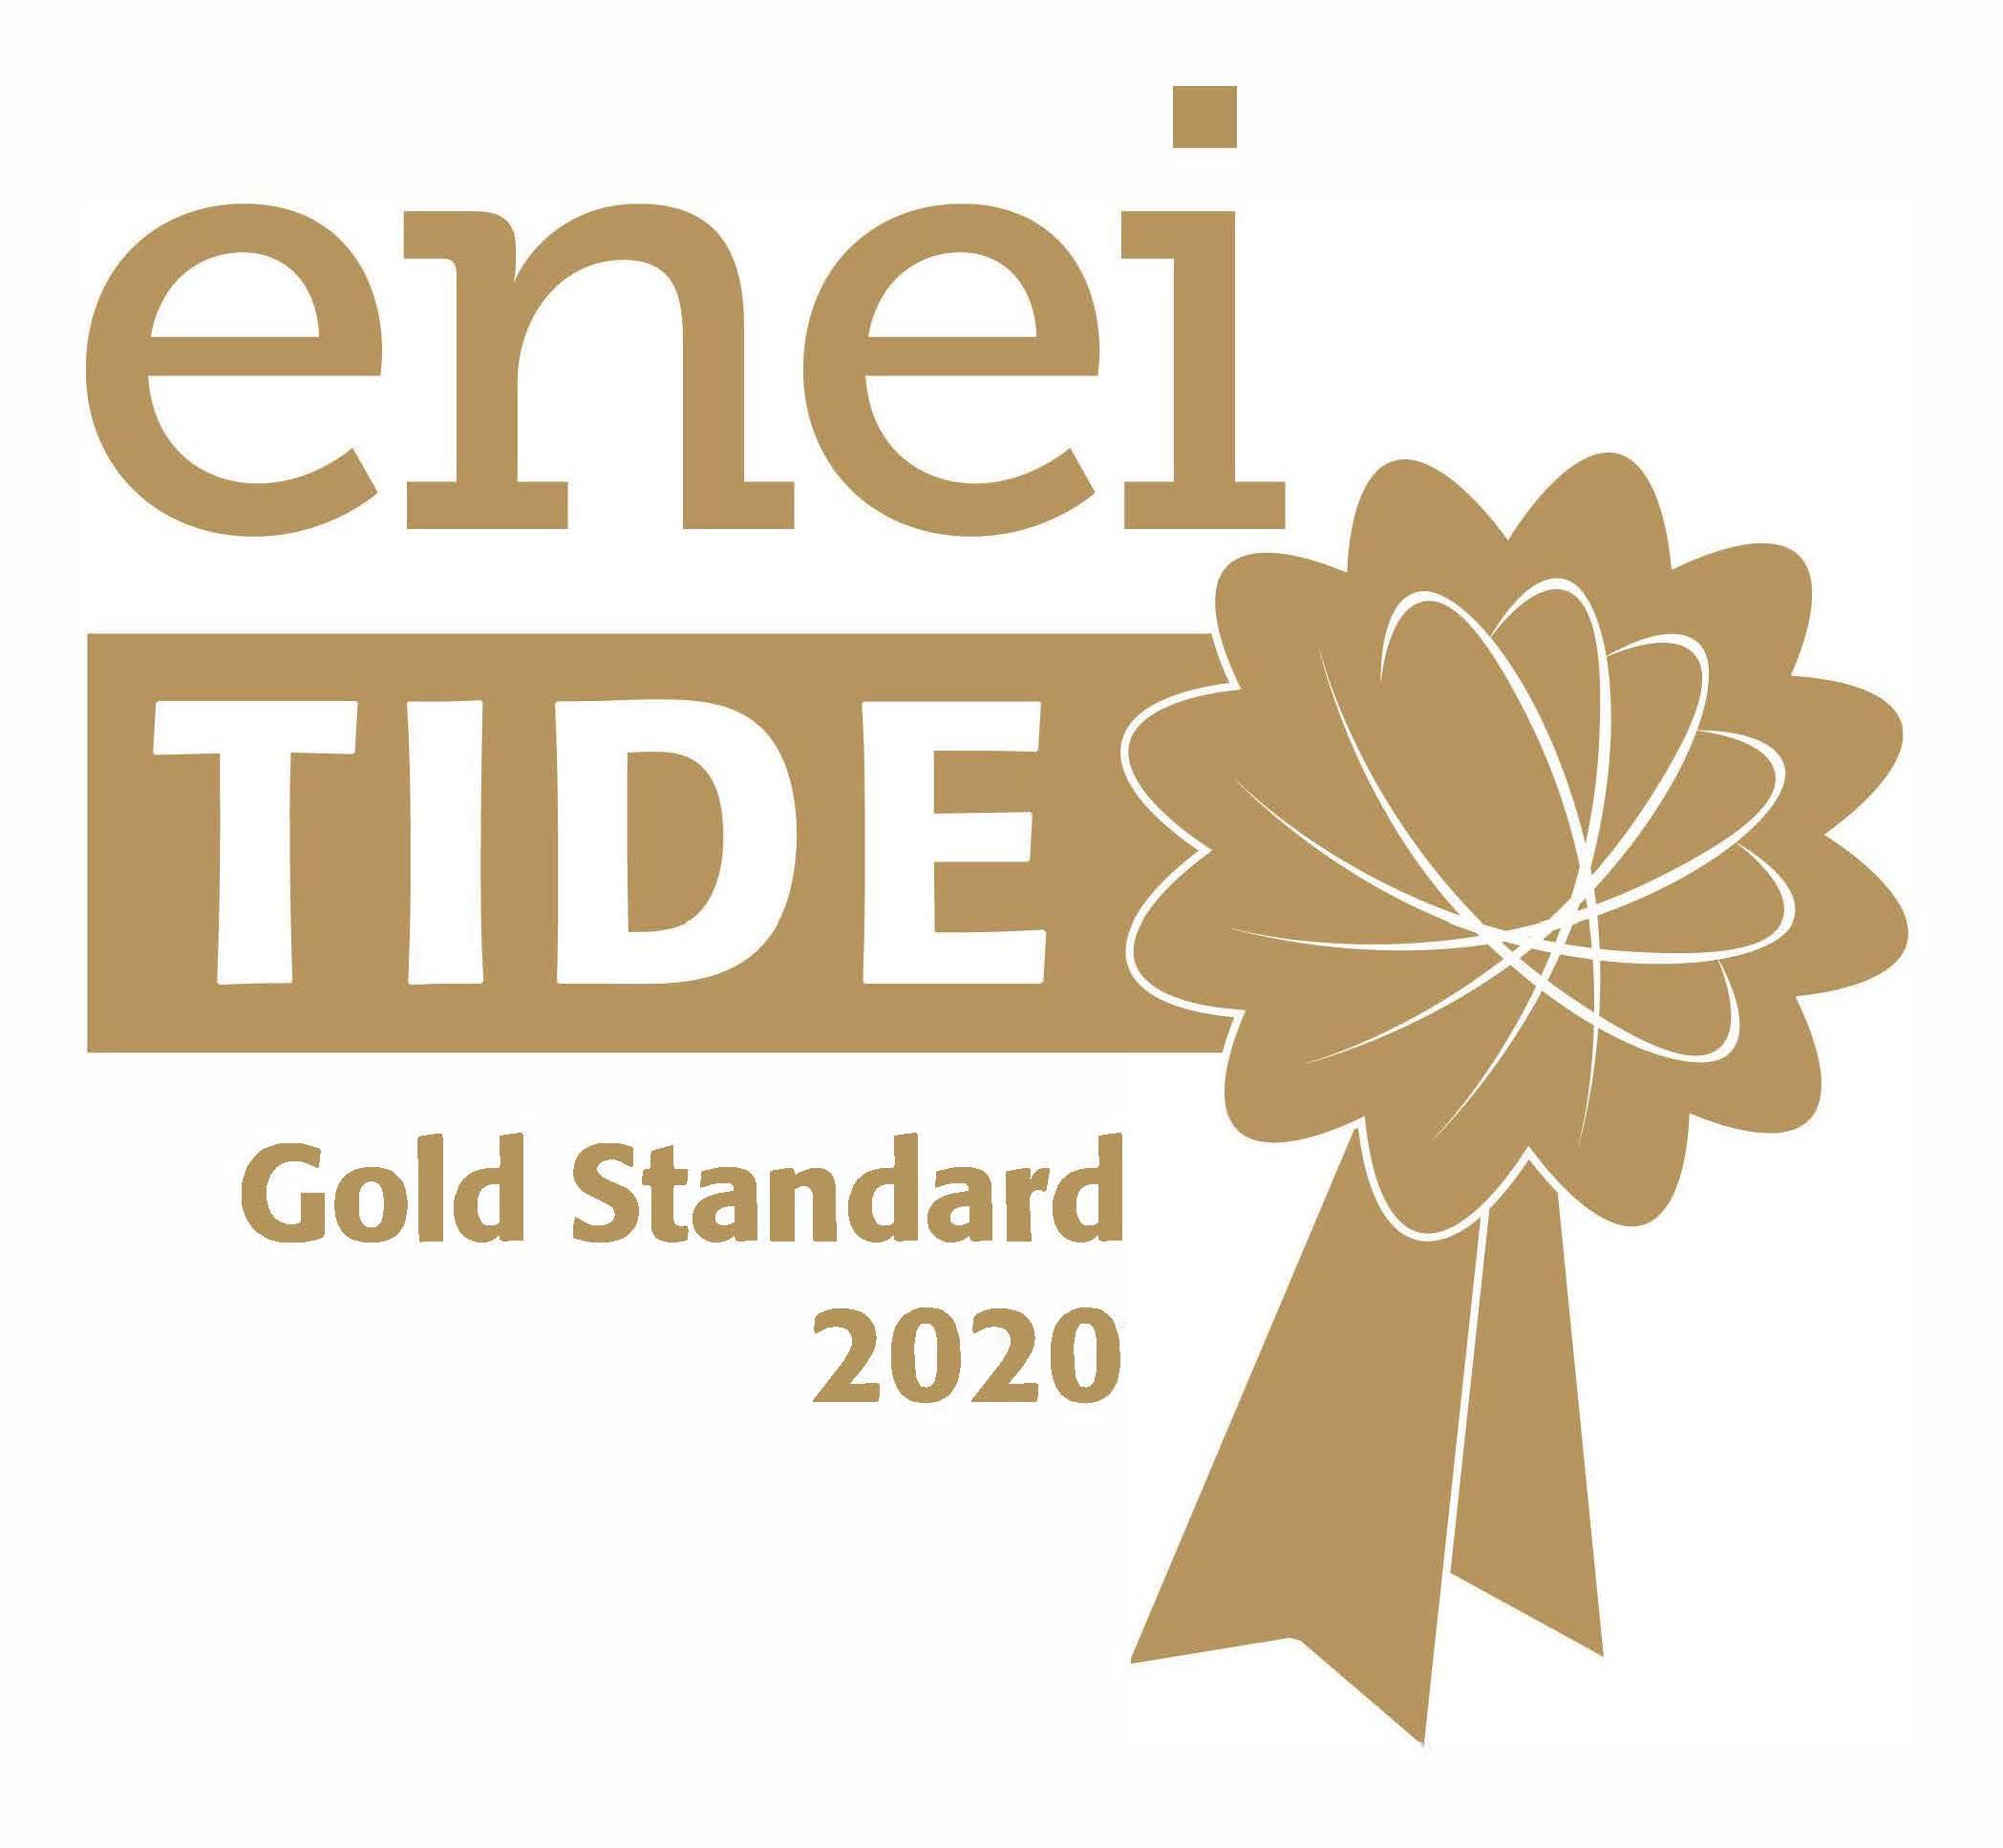 ENEI TIDE (Talent Inclusion & Diversity Evaluation) gold standard award